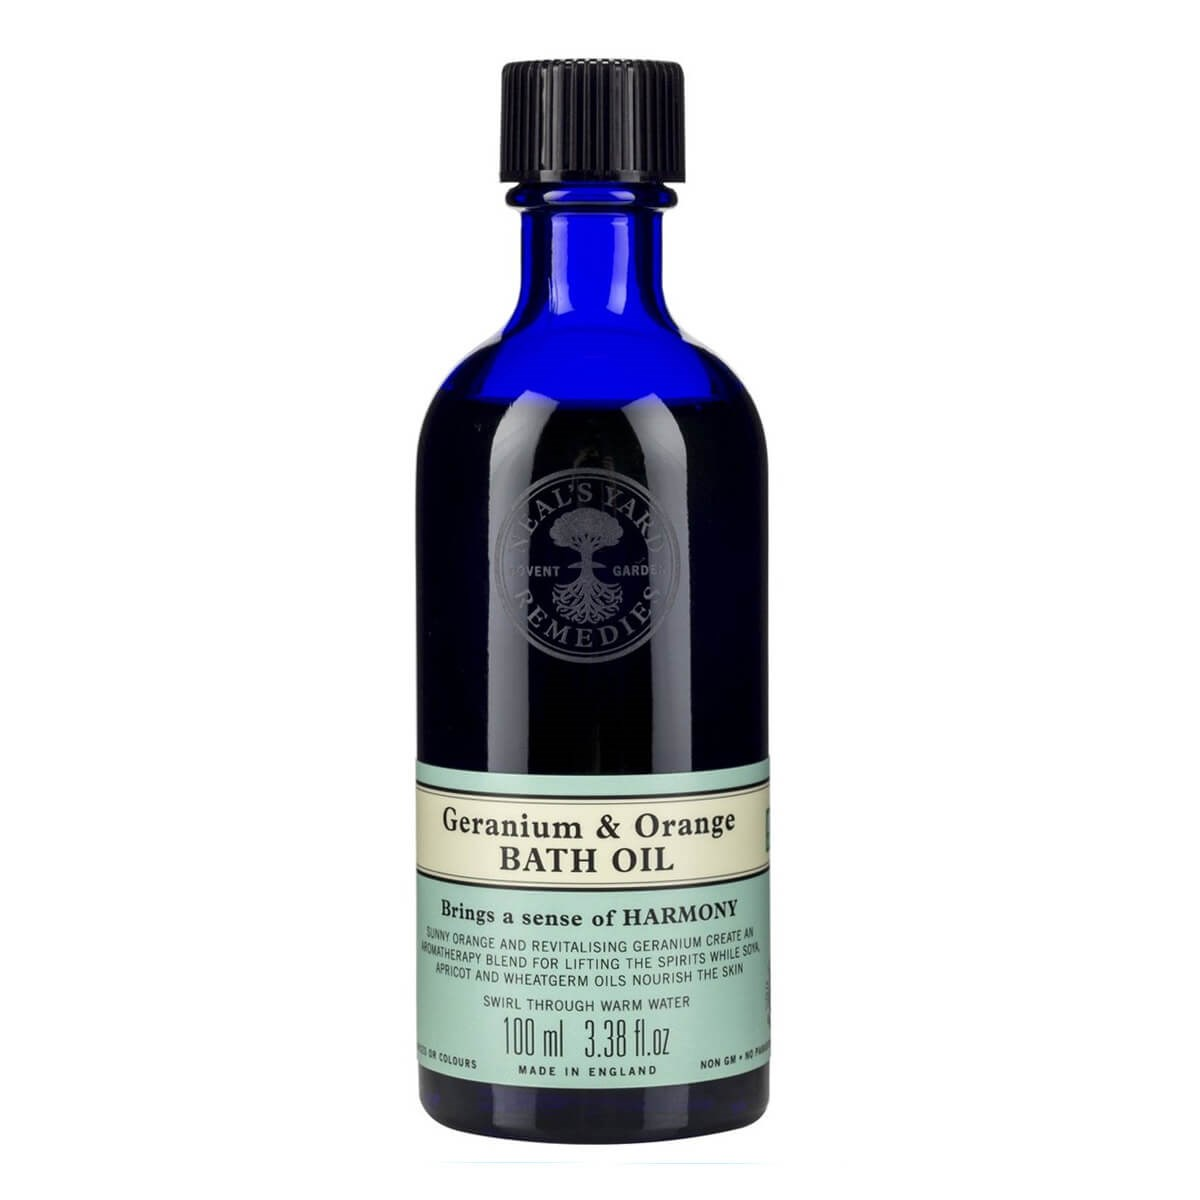 Neal's Yard Remedies Geranium & Orange Bath Oil